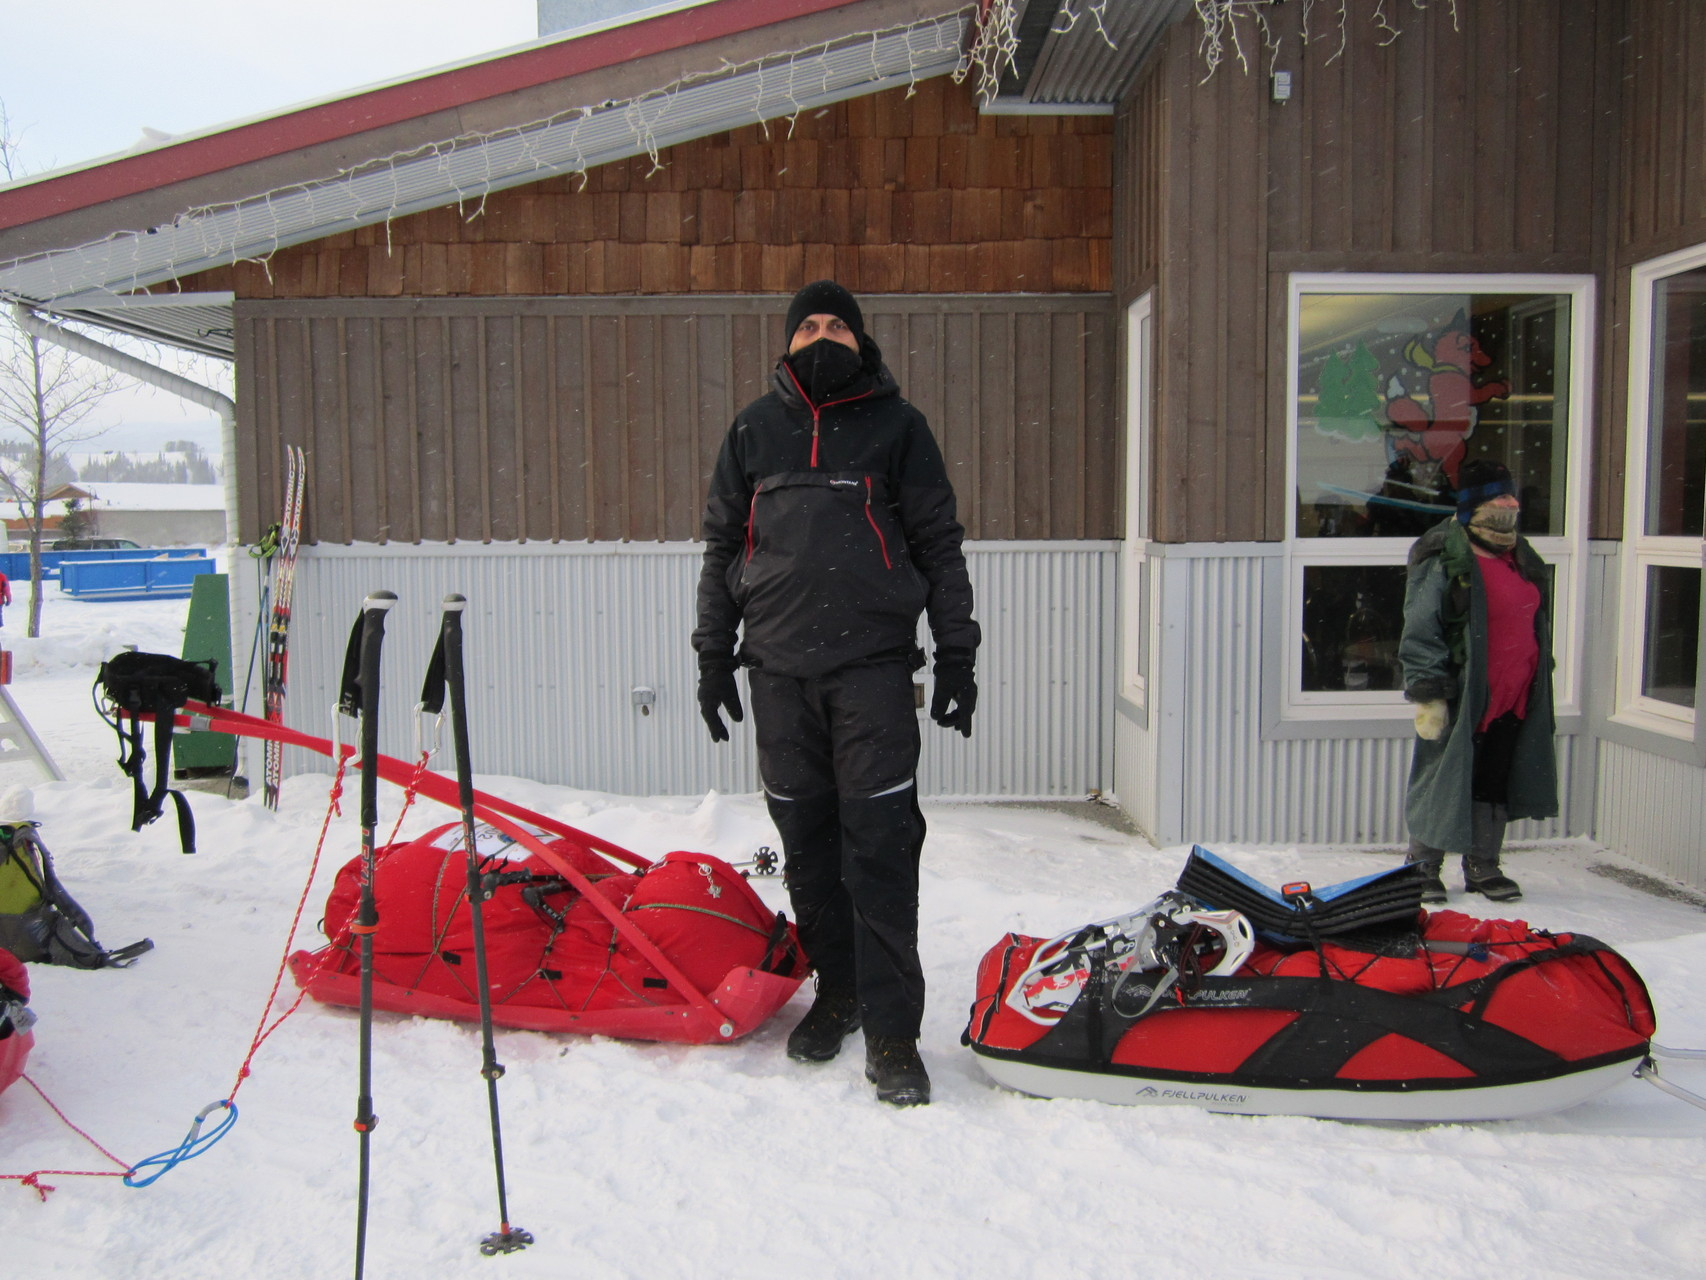 430 Meilen Yukon Arctic Ultra 2015 (Aufgabe nach 20 Km)